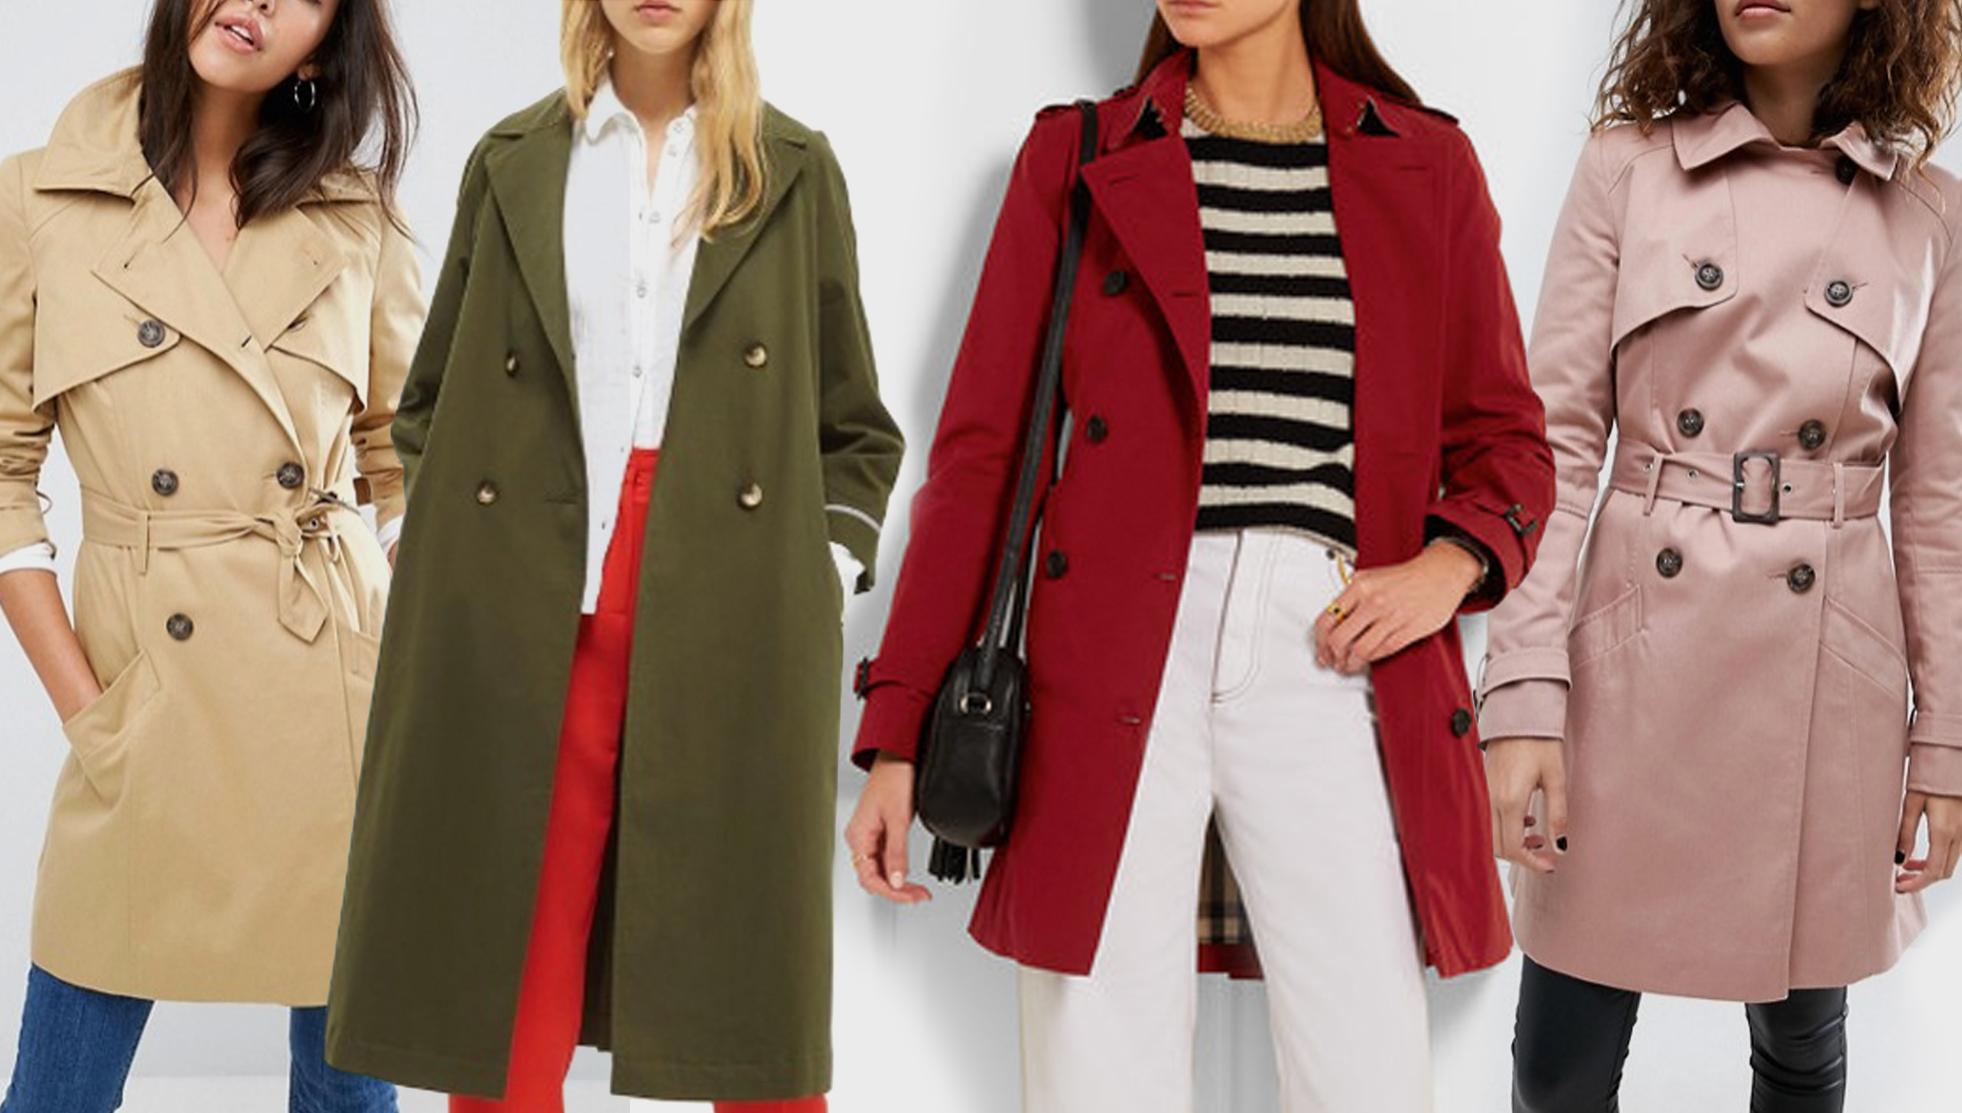 trench coats blair eadie atlantic-pacific